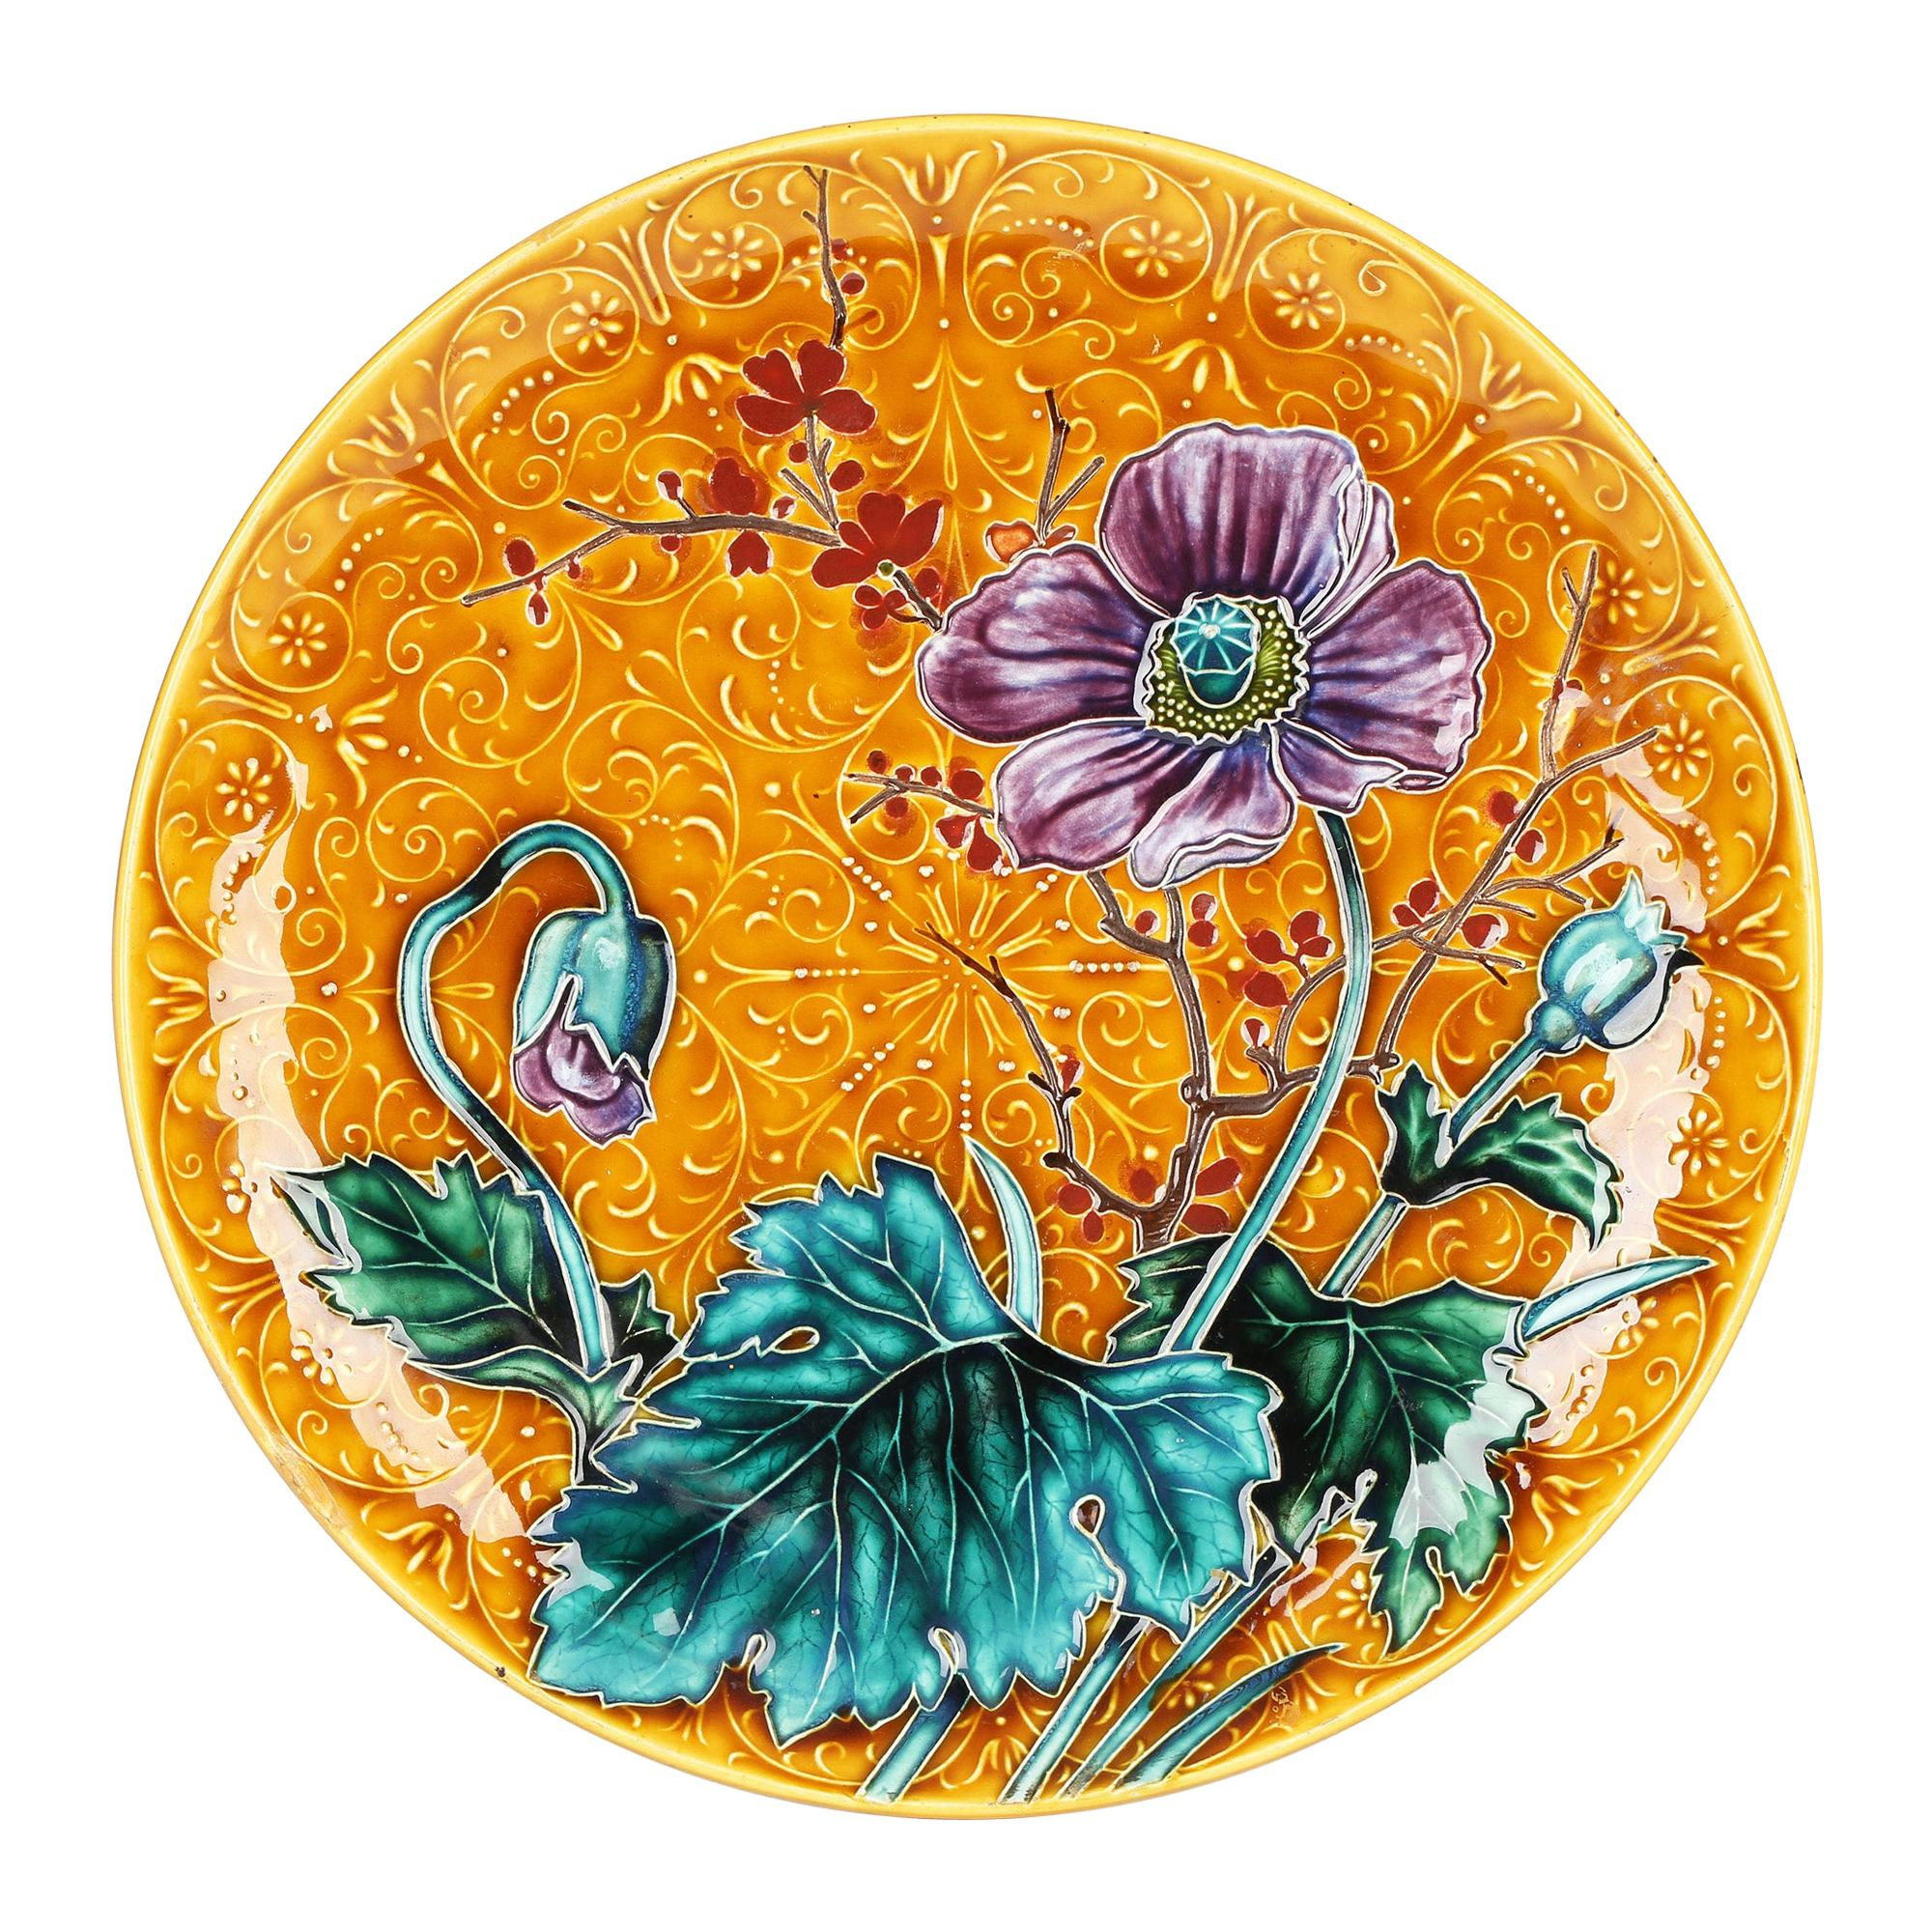 Austrian Art Nouveau Pottery Wall Plaque with Tubelined Floral Designs